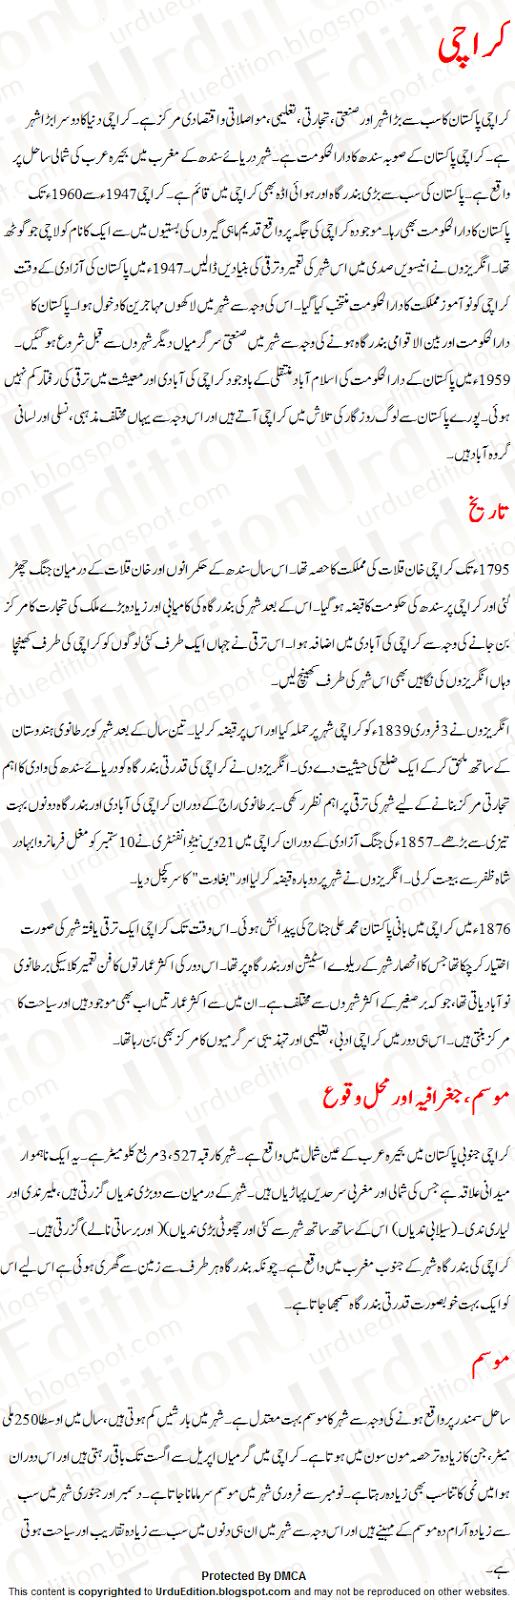 Essay On Karachi In Urdu 1